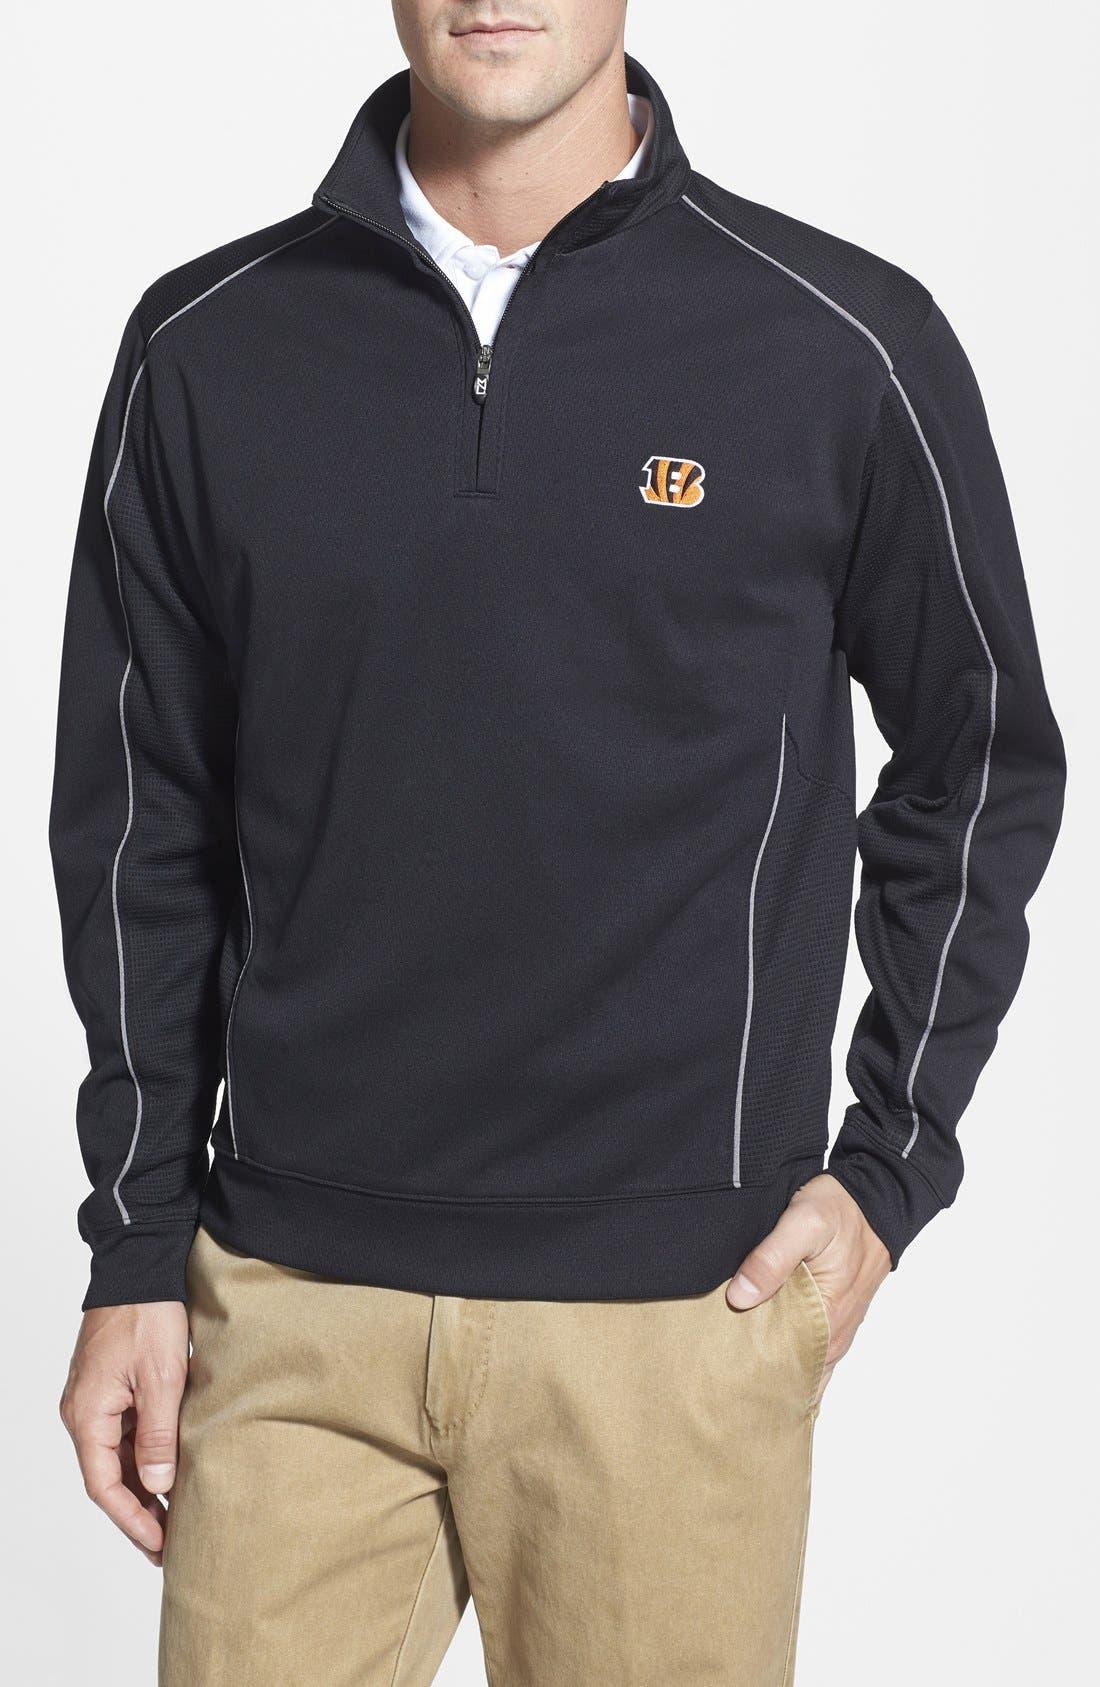 Main Image - Cutter & Buck Cincinnati Bengals - Edge DryTec Moisture Wicking Half Zip Pullover